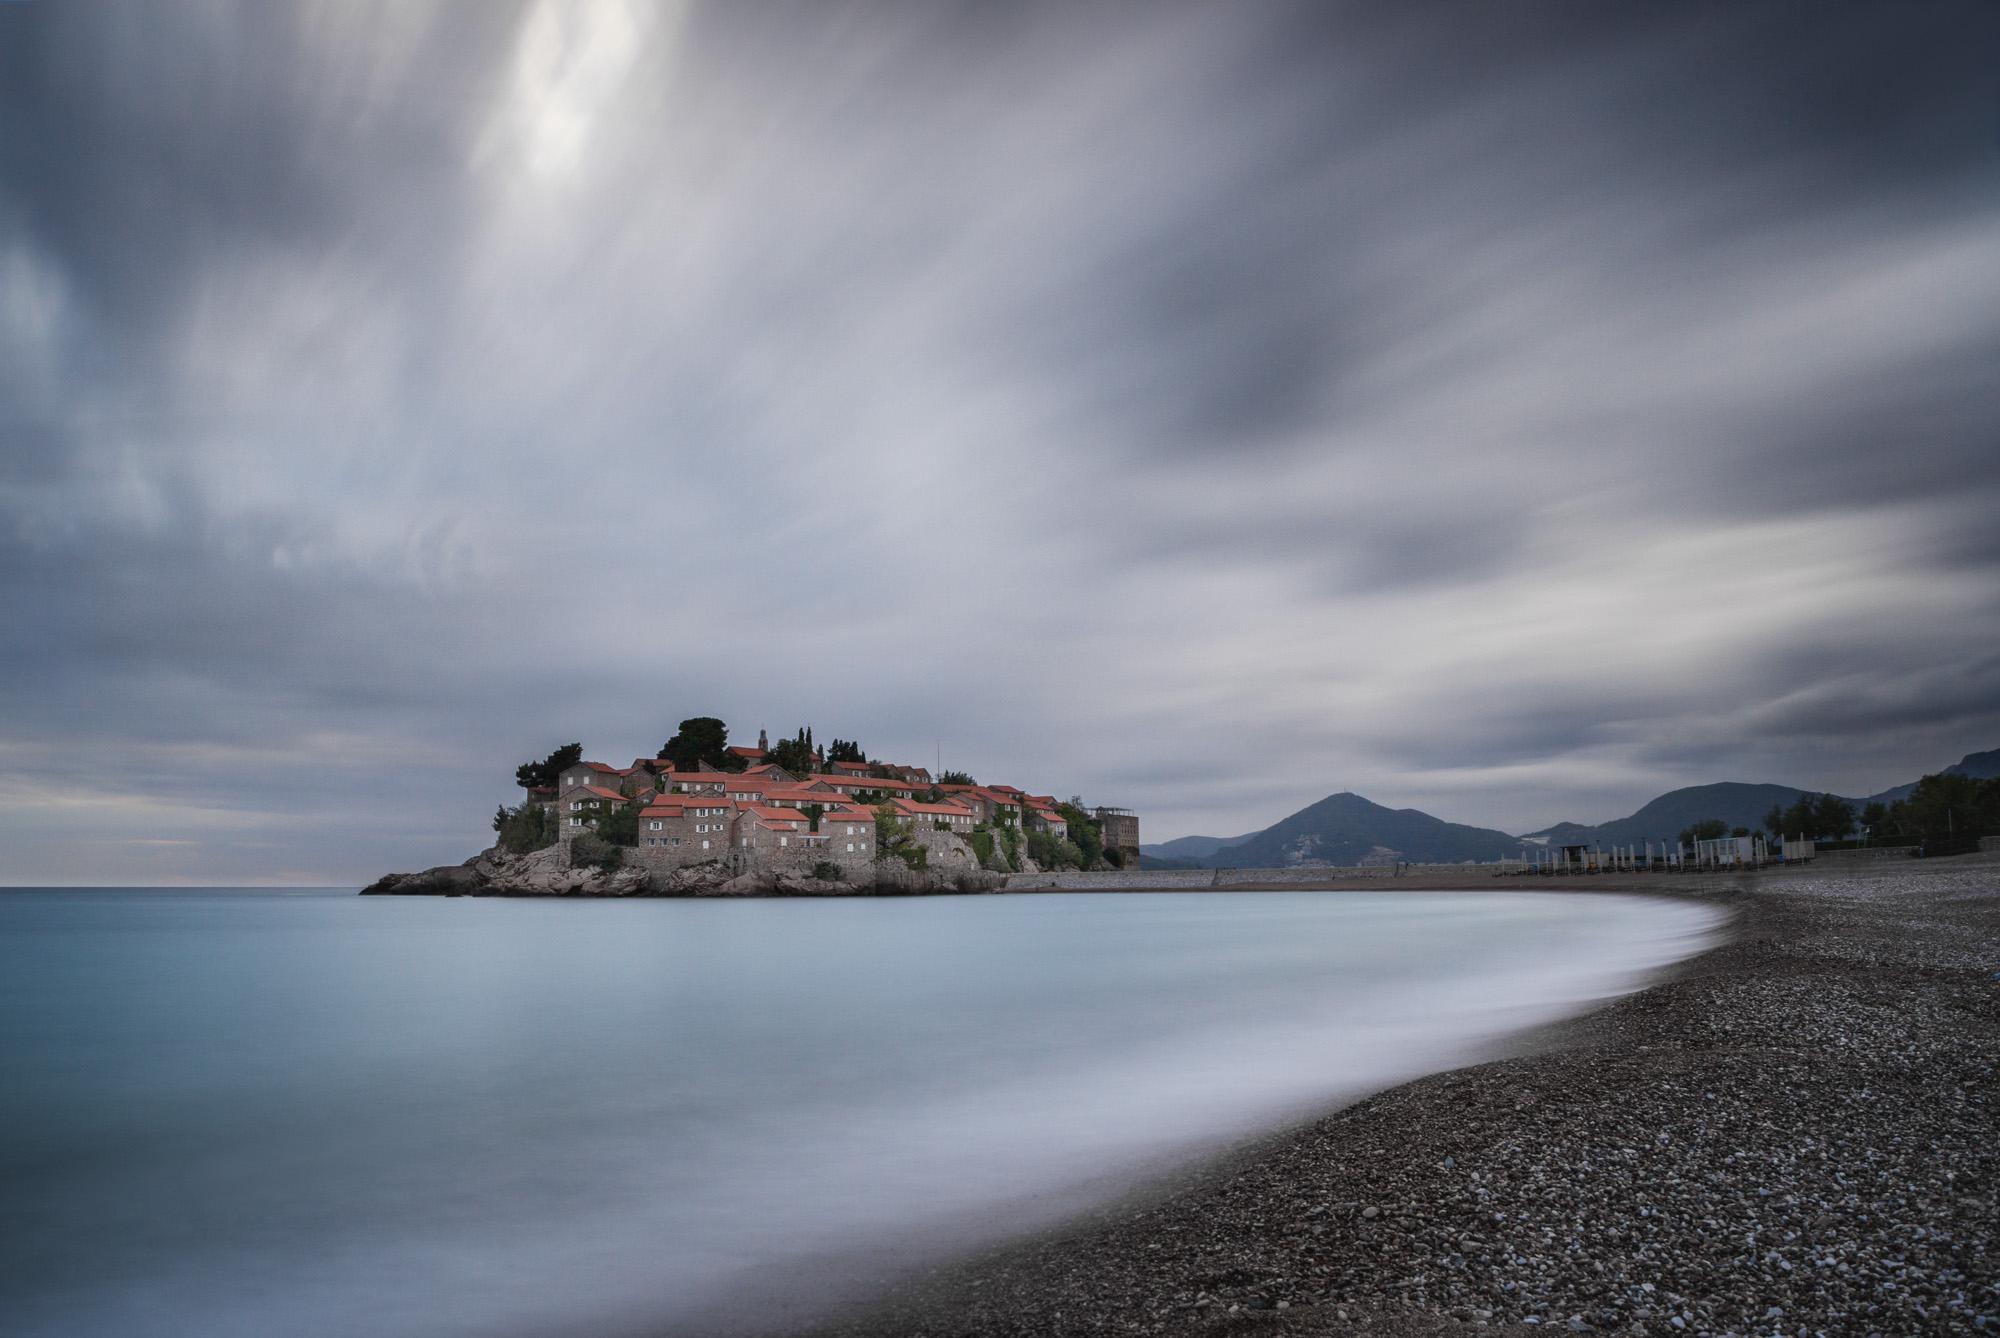 long exposure photograph of Sveti Stefan in Montenegro